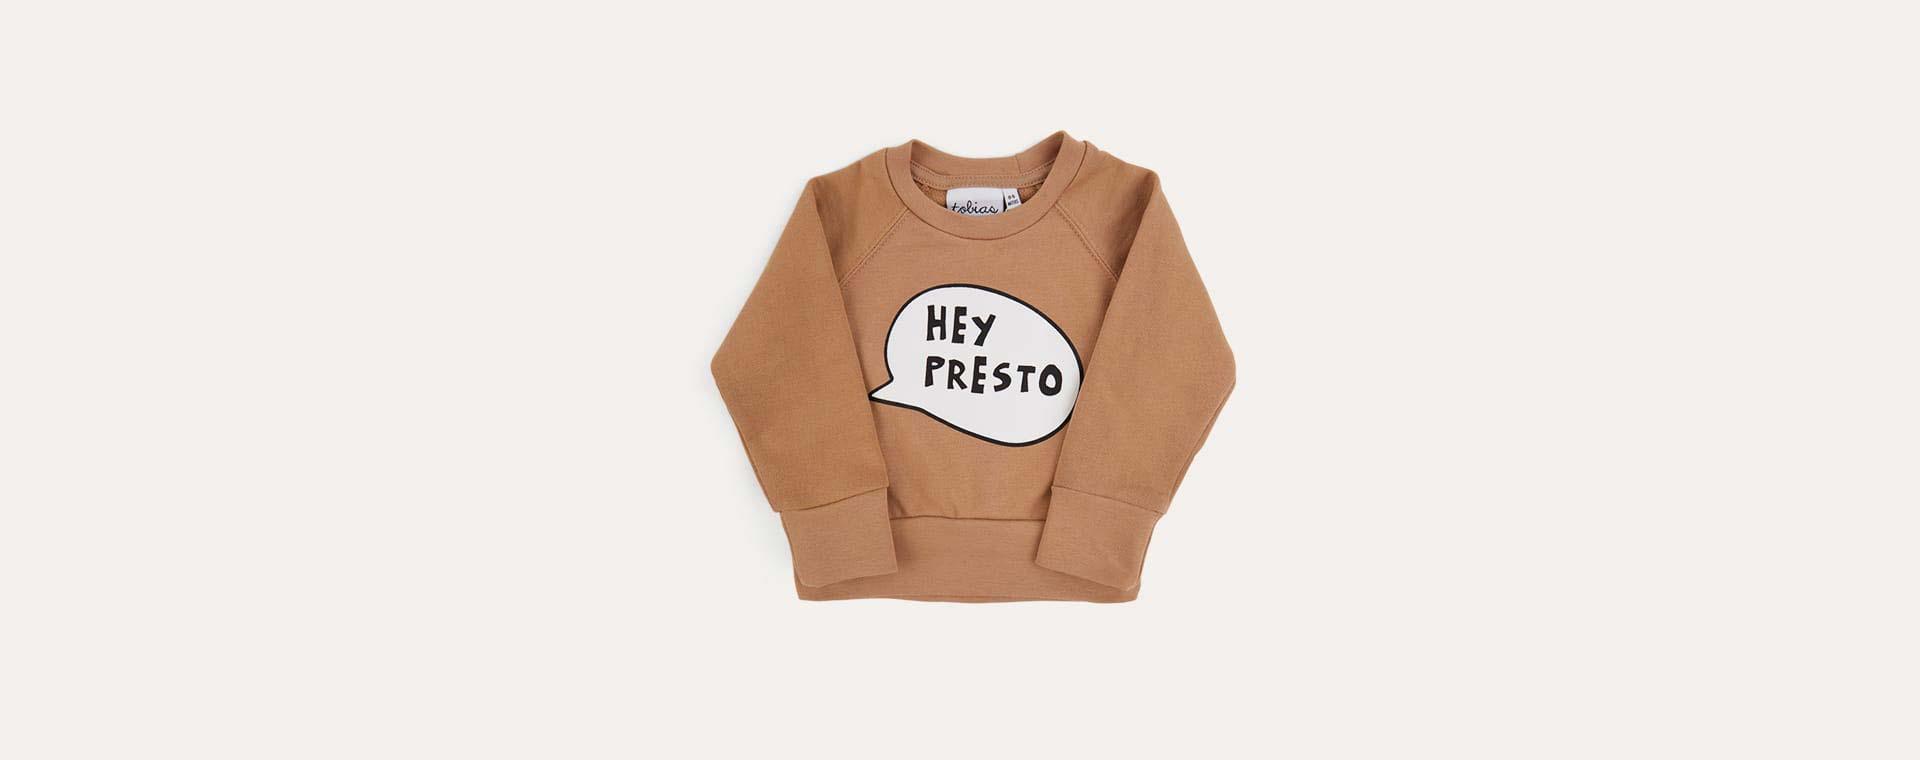 Neutral tobias & the bear Hey Presto Sweatshirt